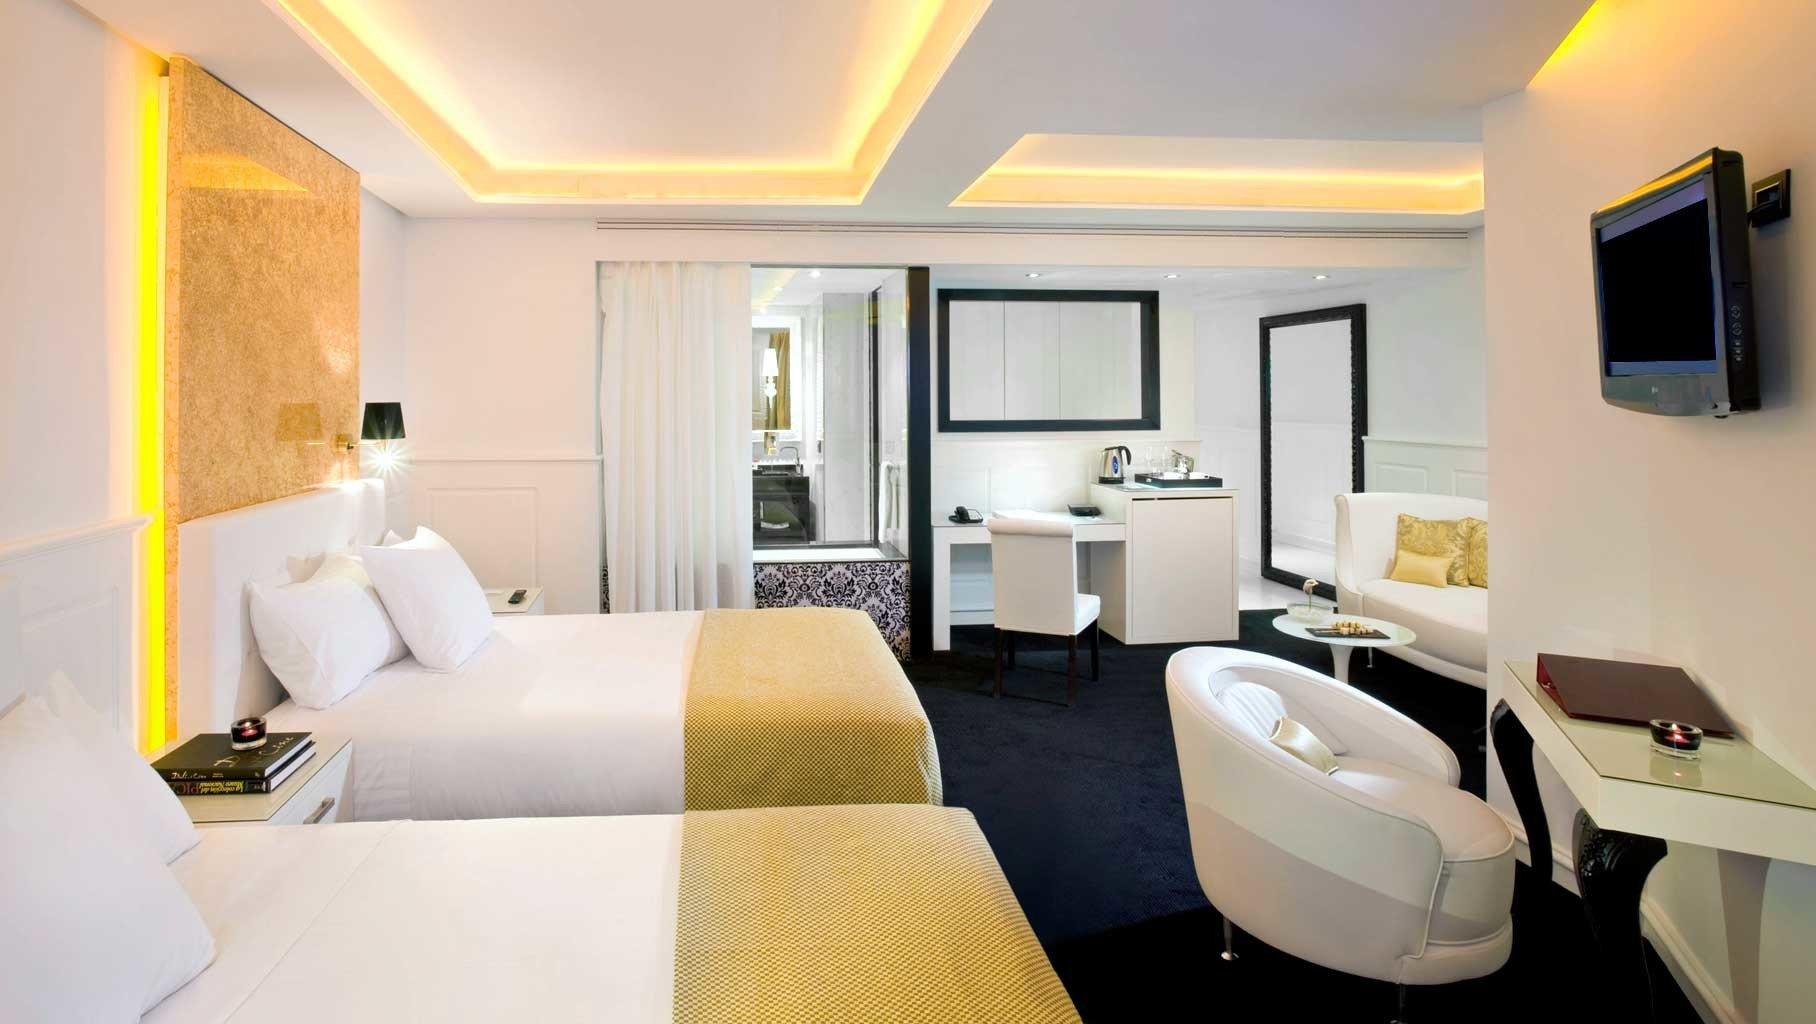 Bedroom Boutique City Suite property condominium scene Villa living room cottage Modern